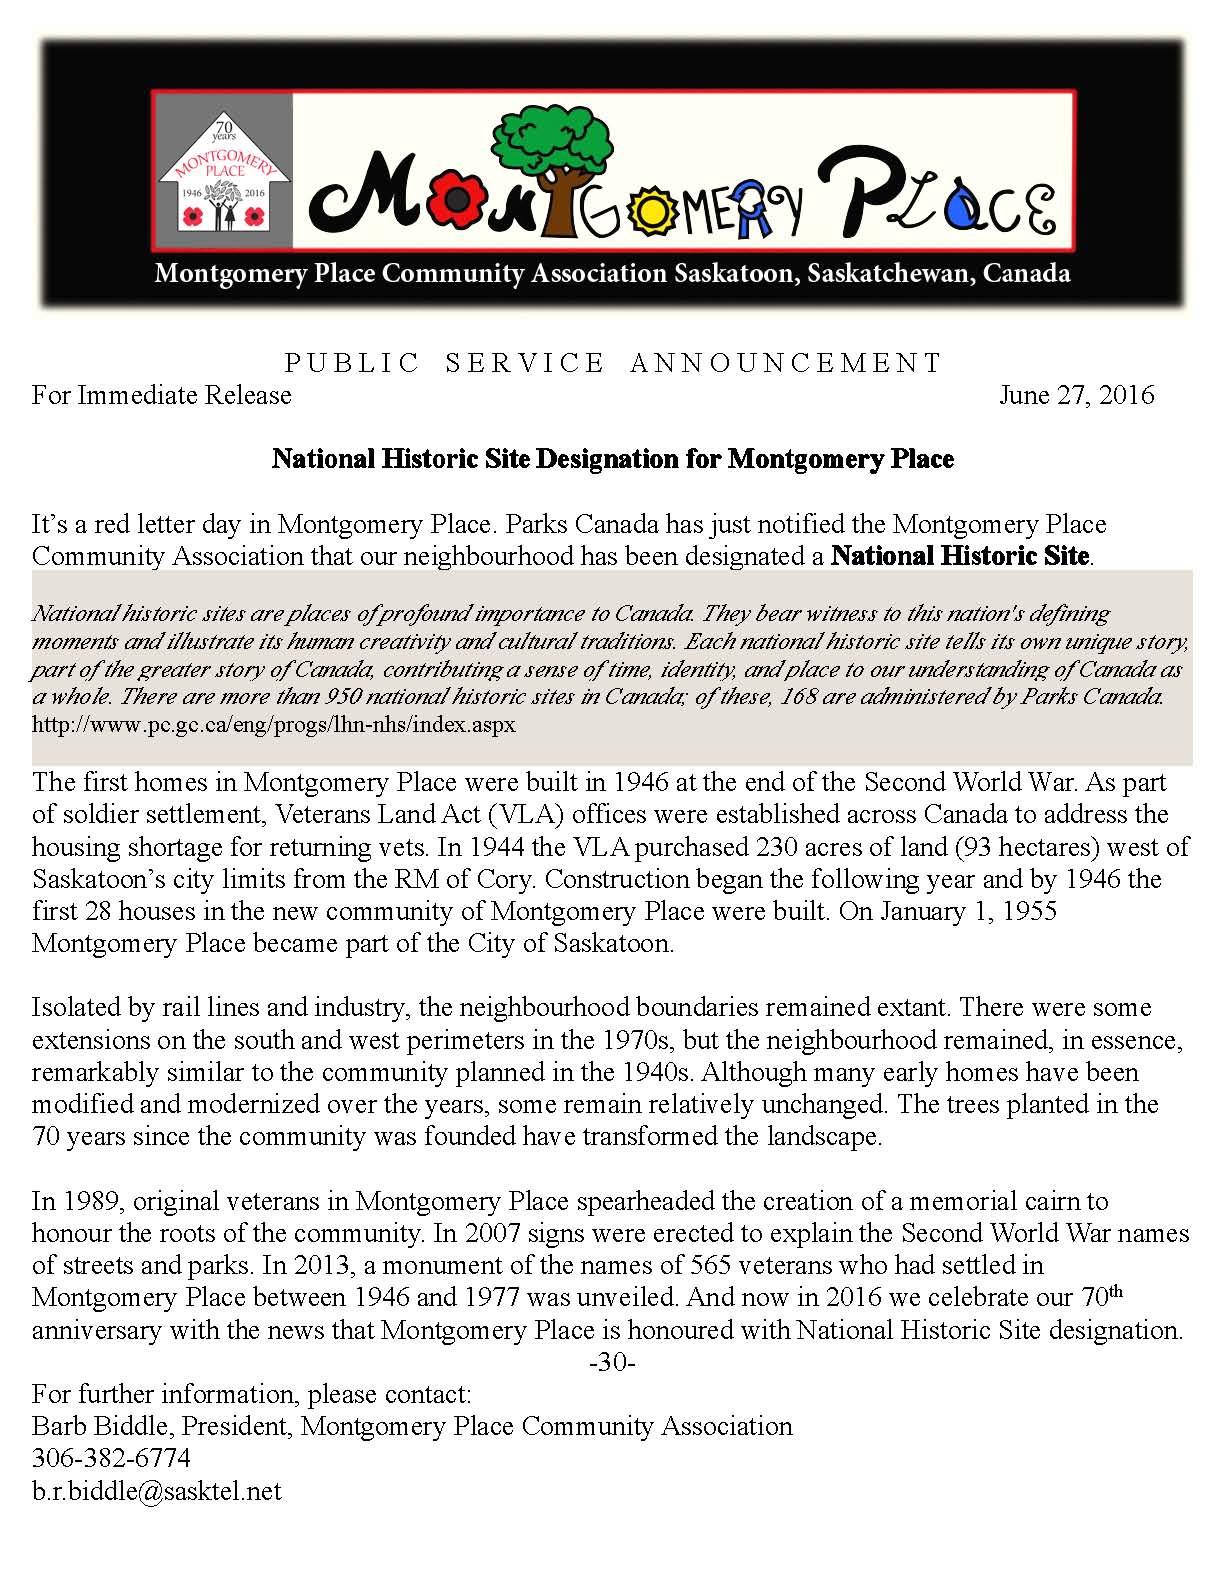 National Historic Site Designation PSA